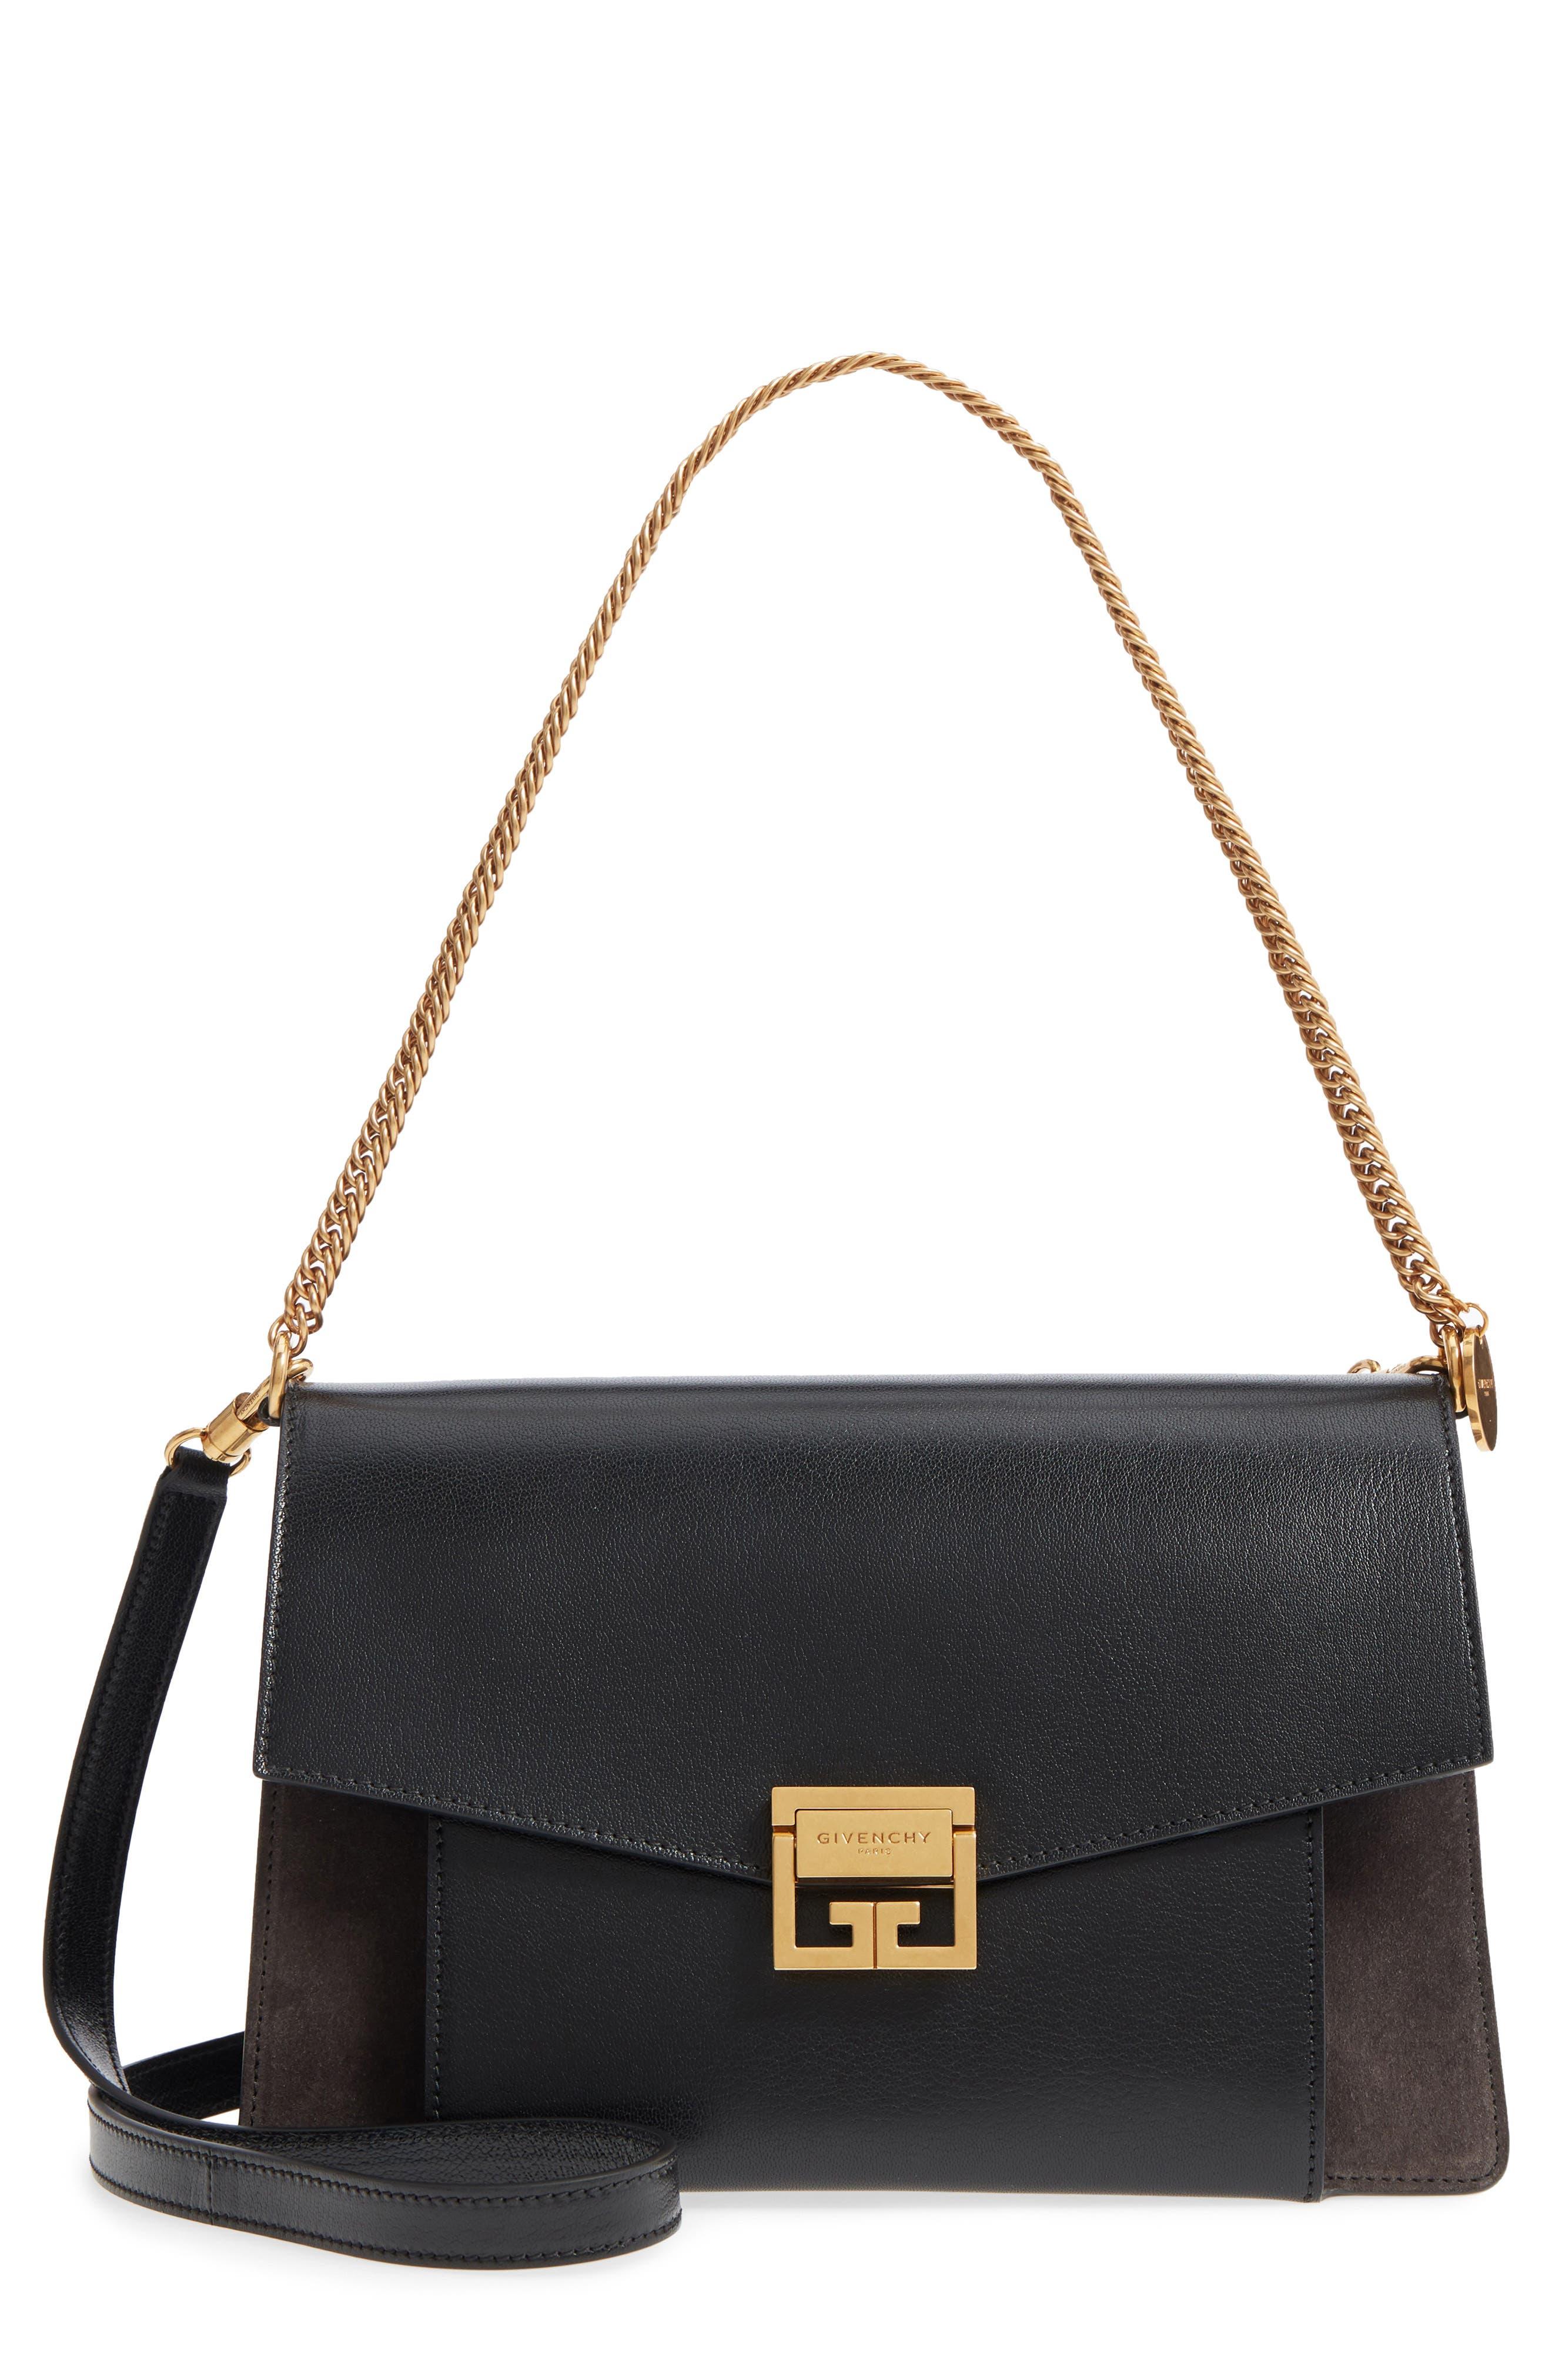 Medium GV3 Leather Crossbody Bag,                             Main thumbnail 1, color,                             BLACK/ GREY